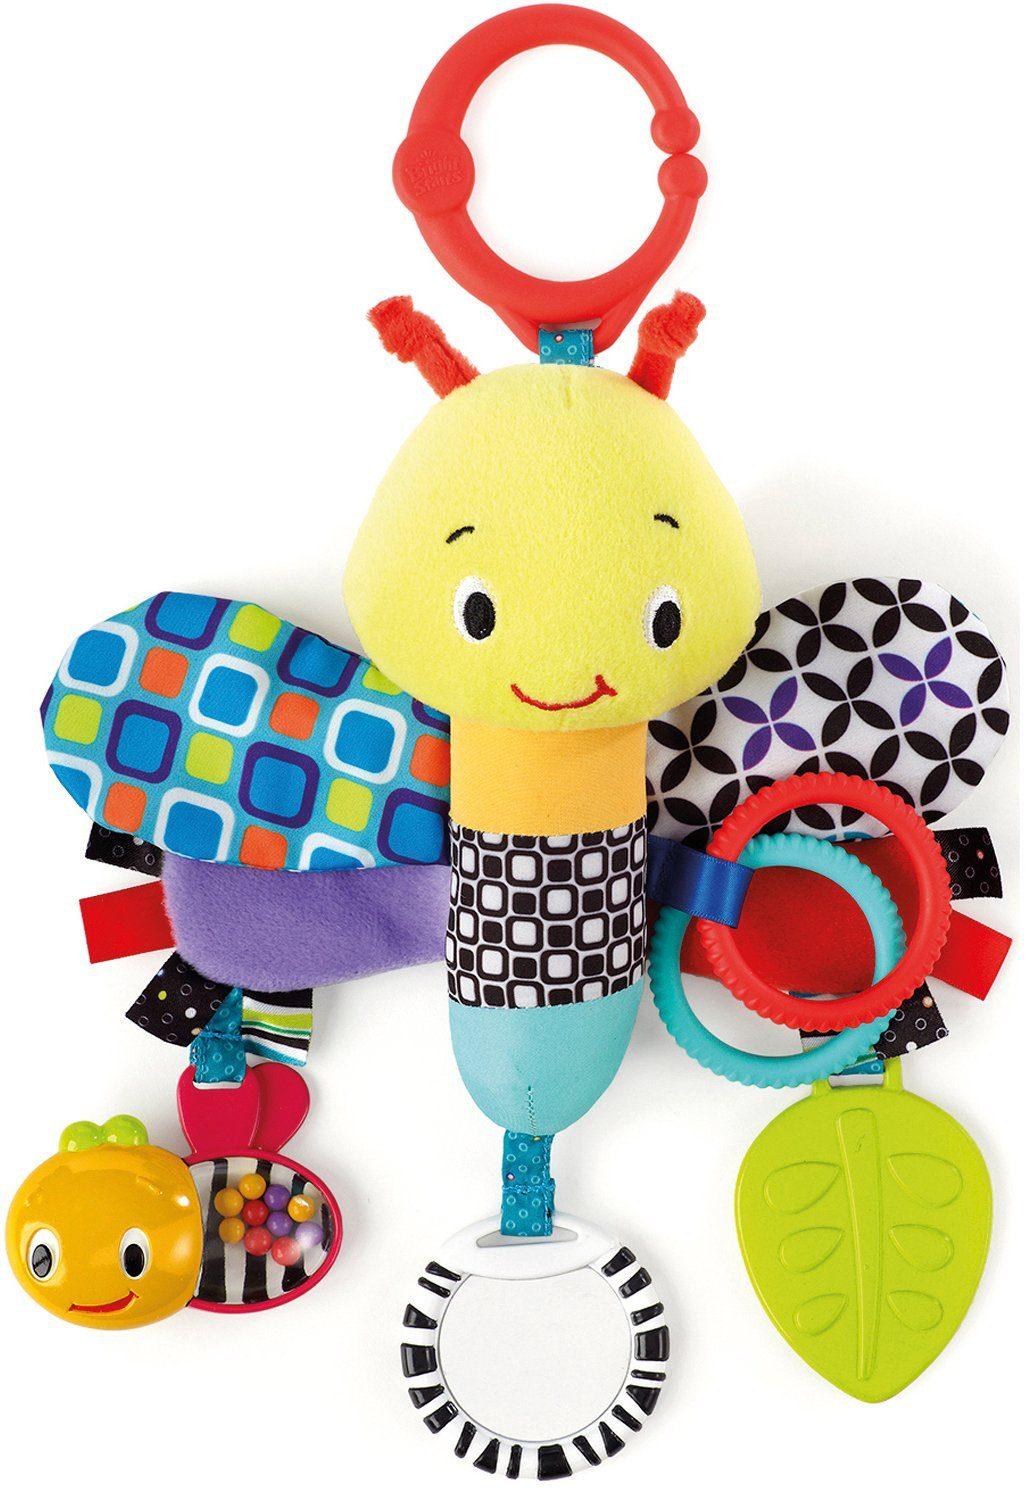 Kids II Plüschlibelle mit integriertem Beißring, »BS Start Senses Sensory Plush Pals«